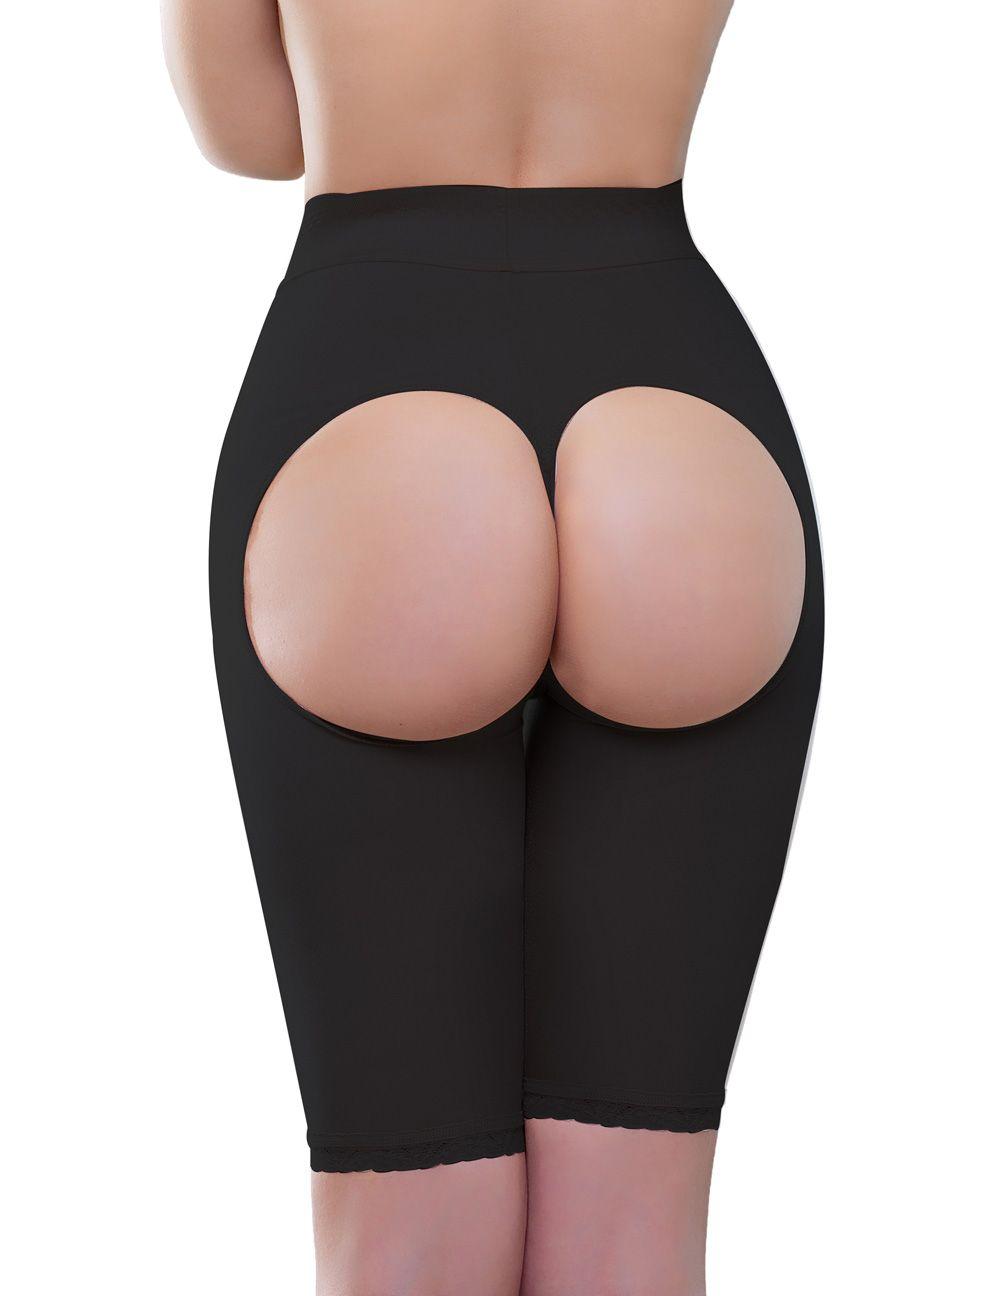 781b31e368ed3 Shapewear for Women  Vedette 911 Amie High Waist Panty Buttock ...